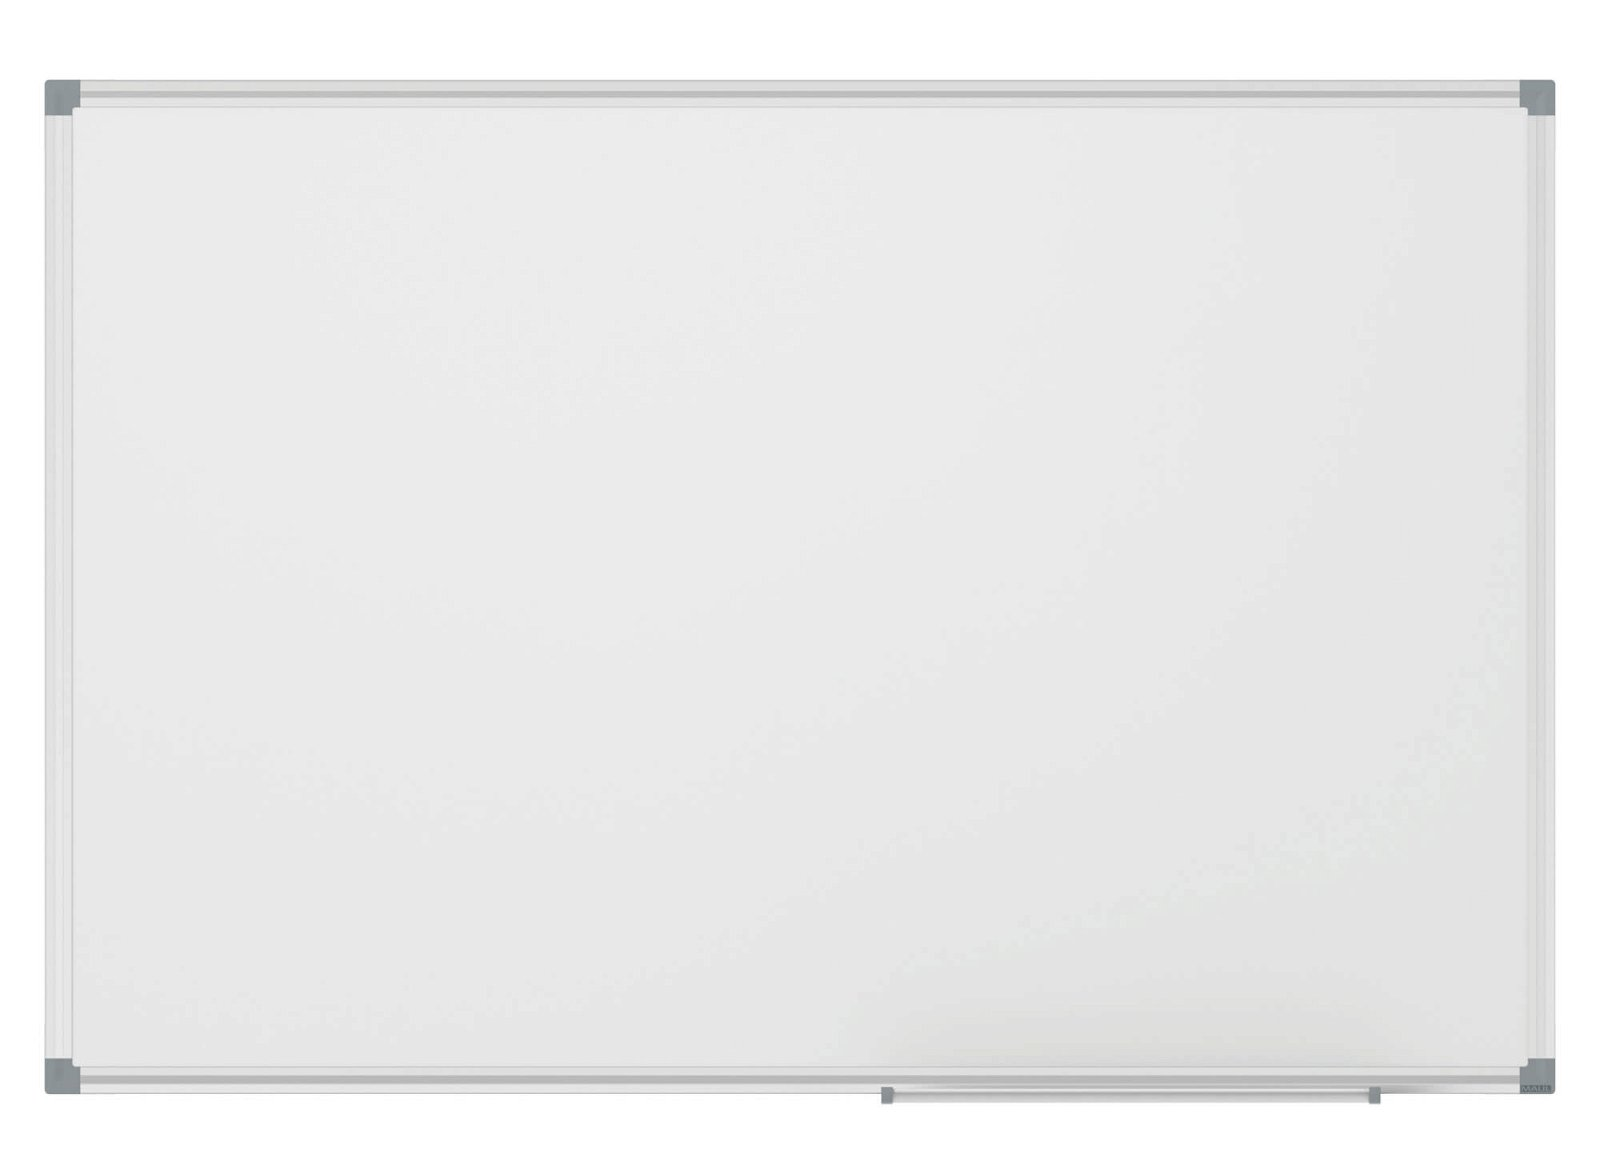 Whiteboard MAULstandard, Emaille, 90x180 cm, grau